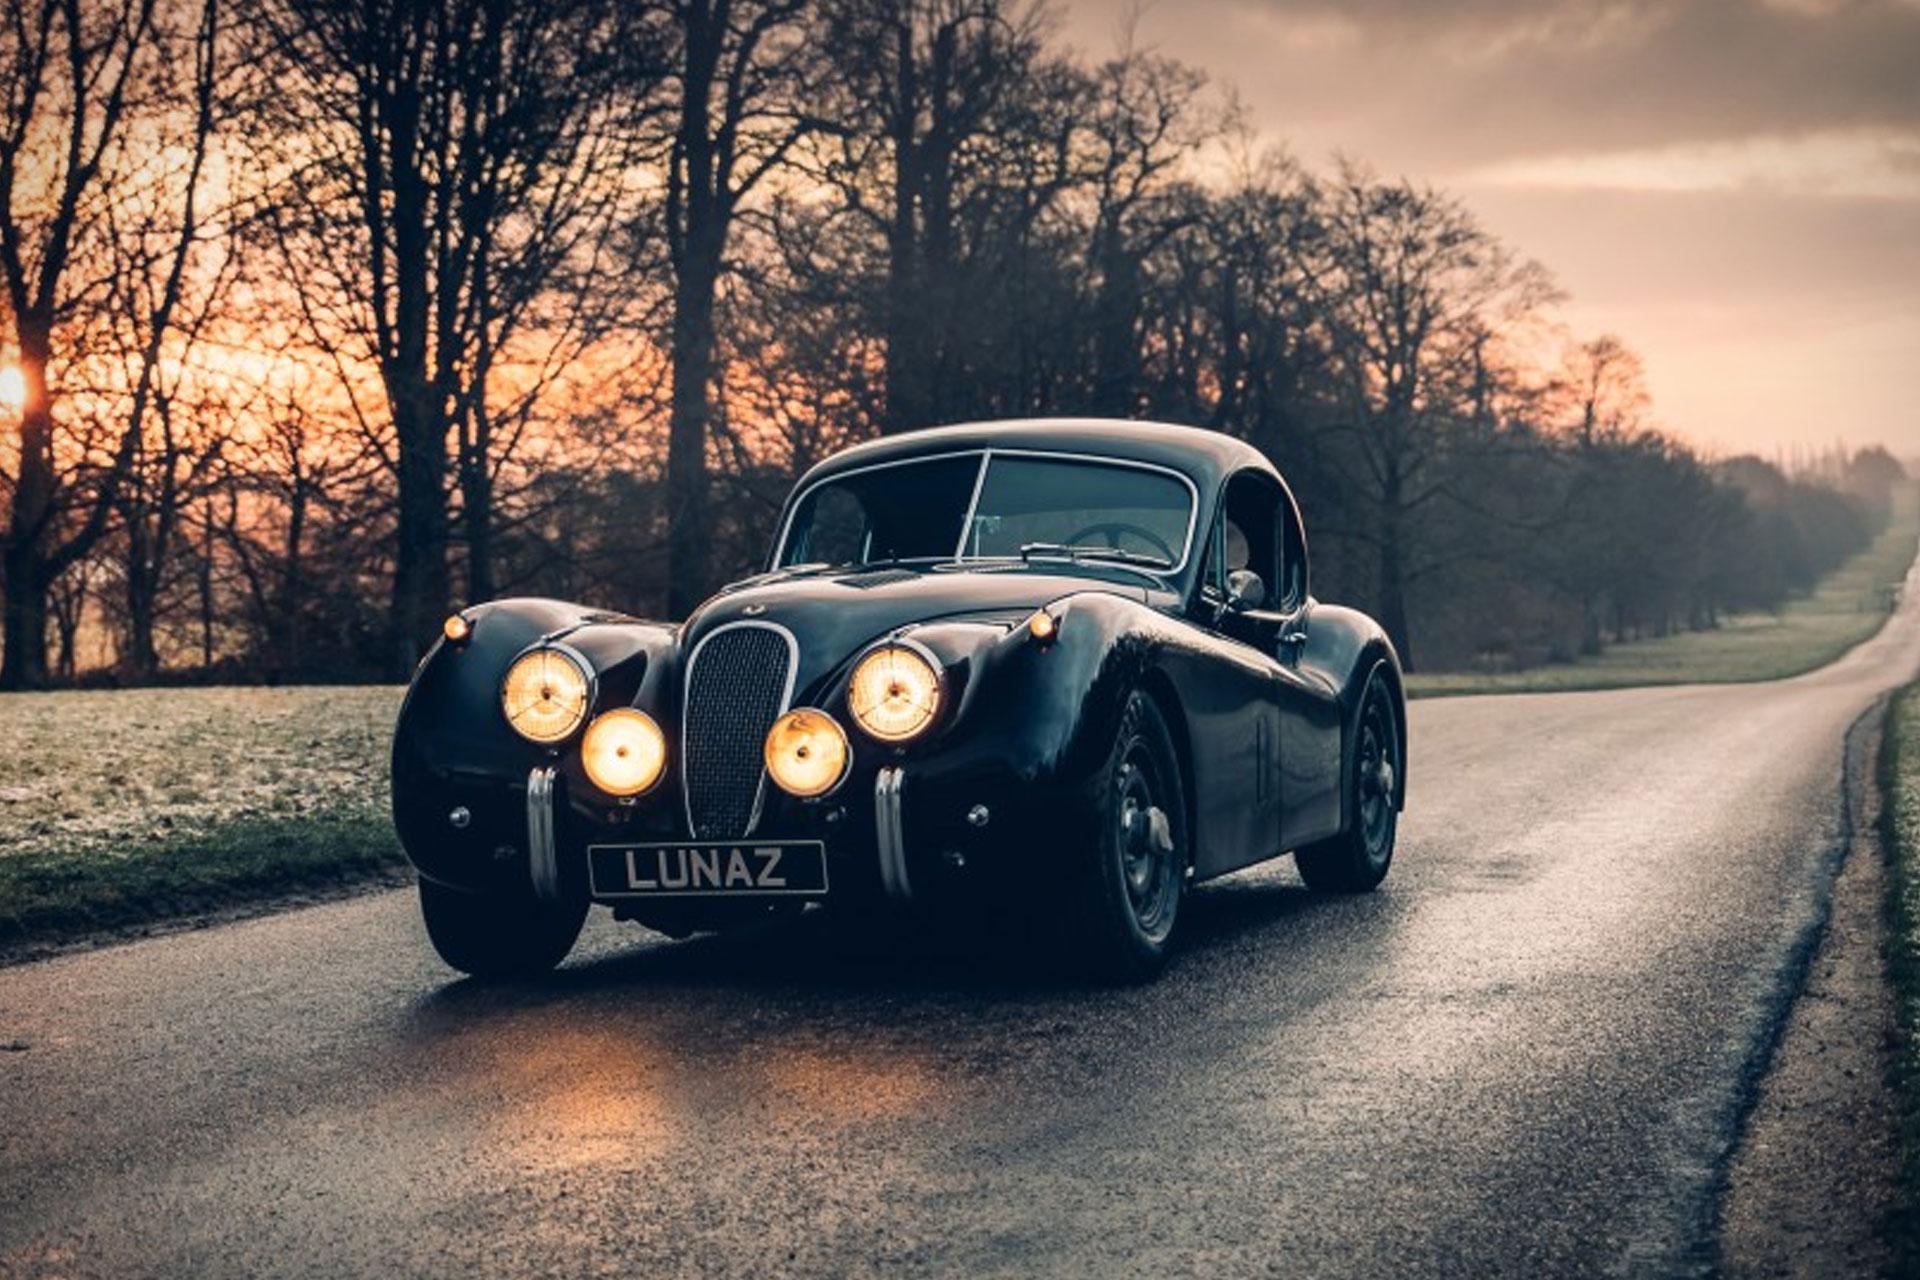 Lunaz Electrified Classic Cars